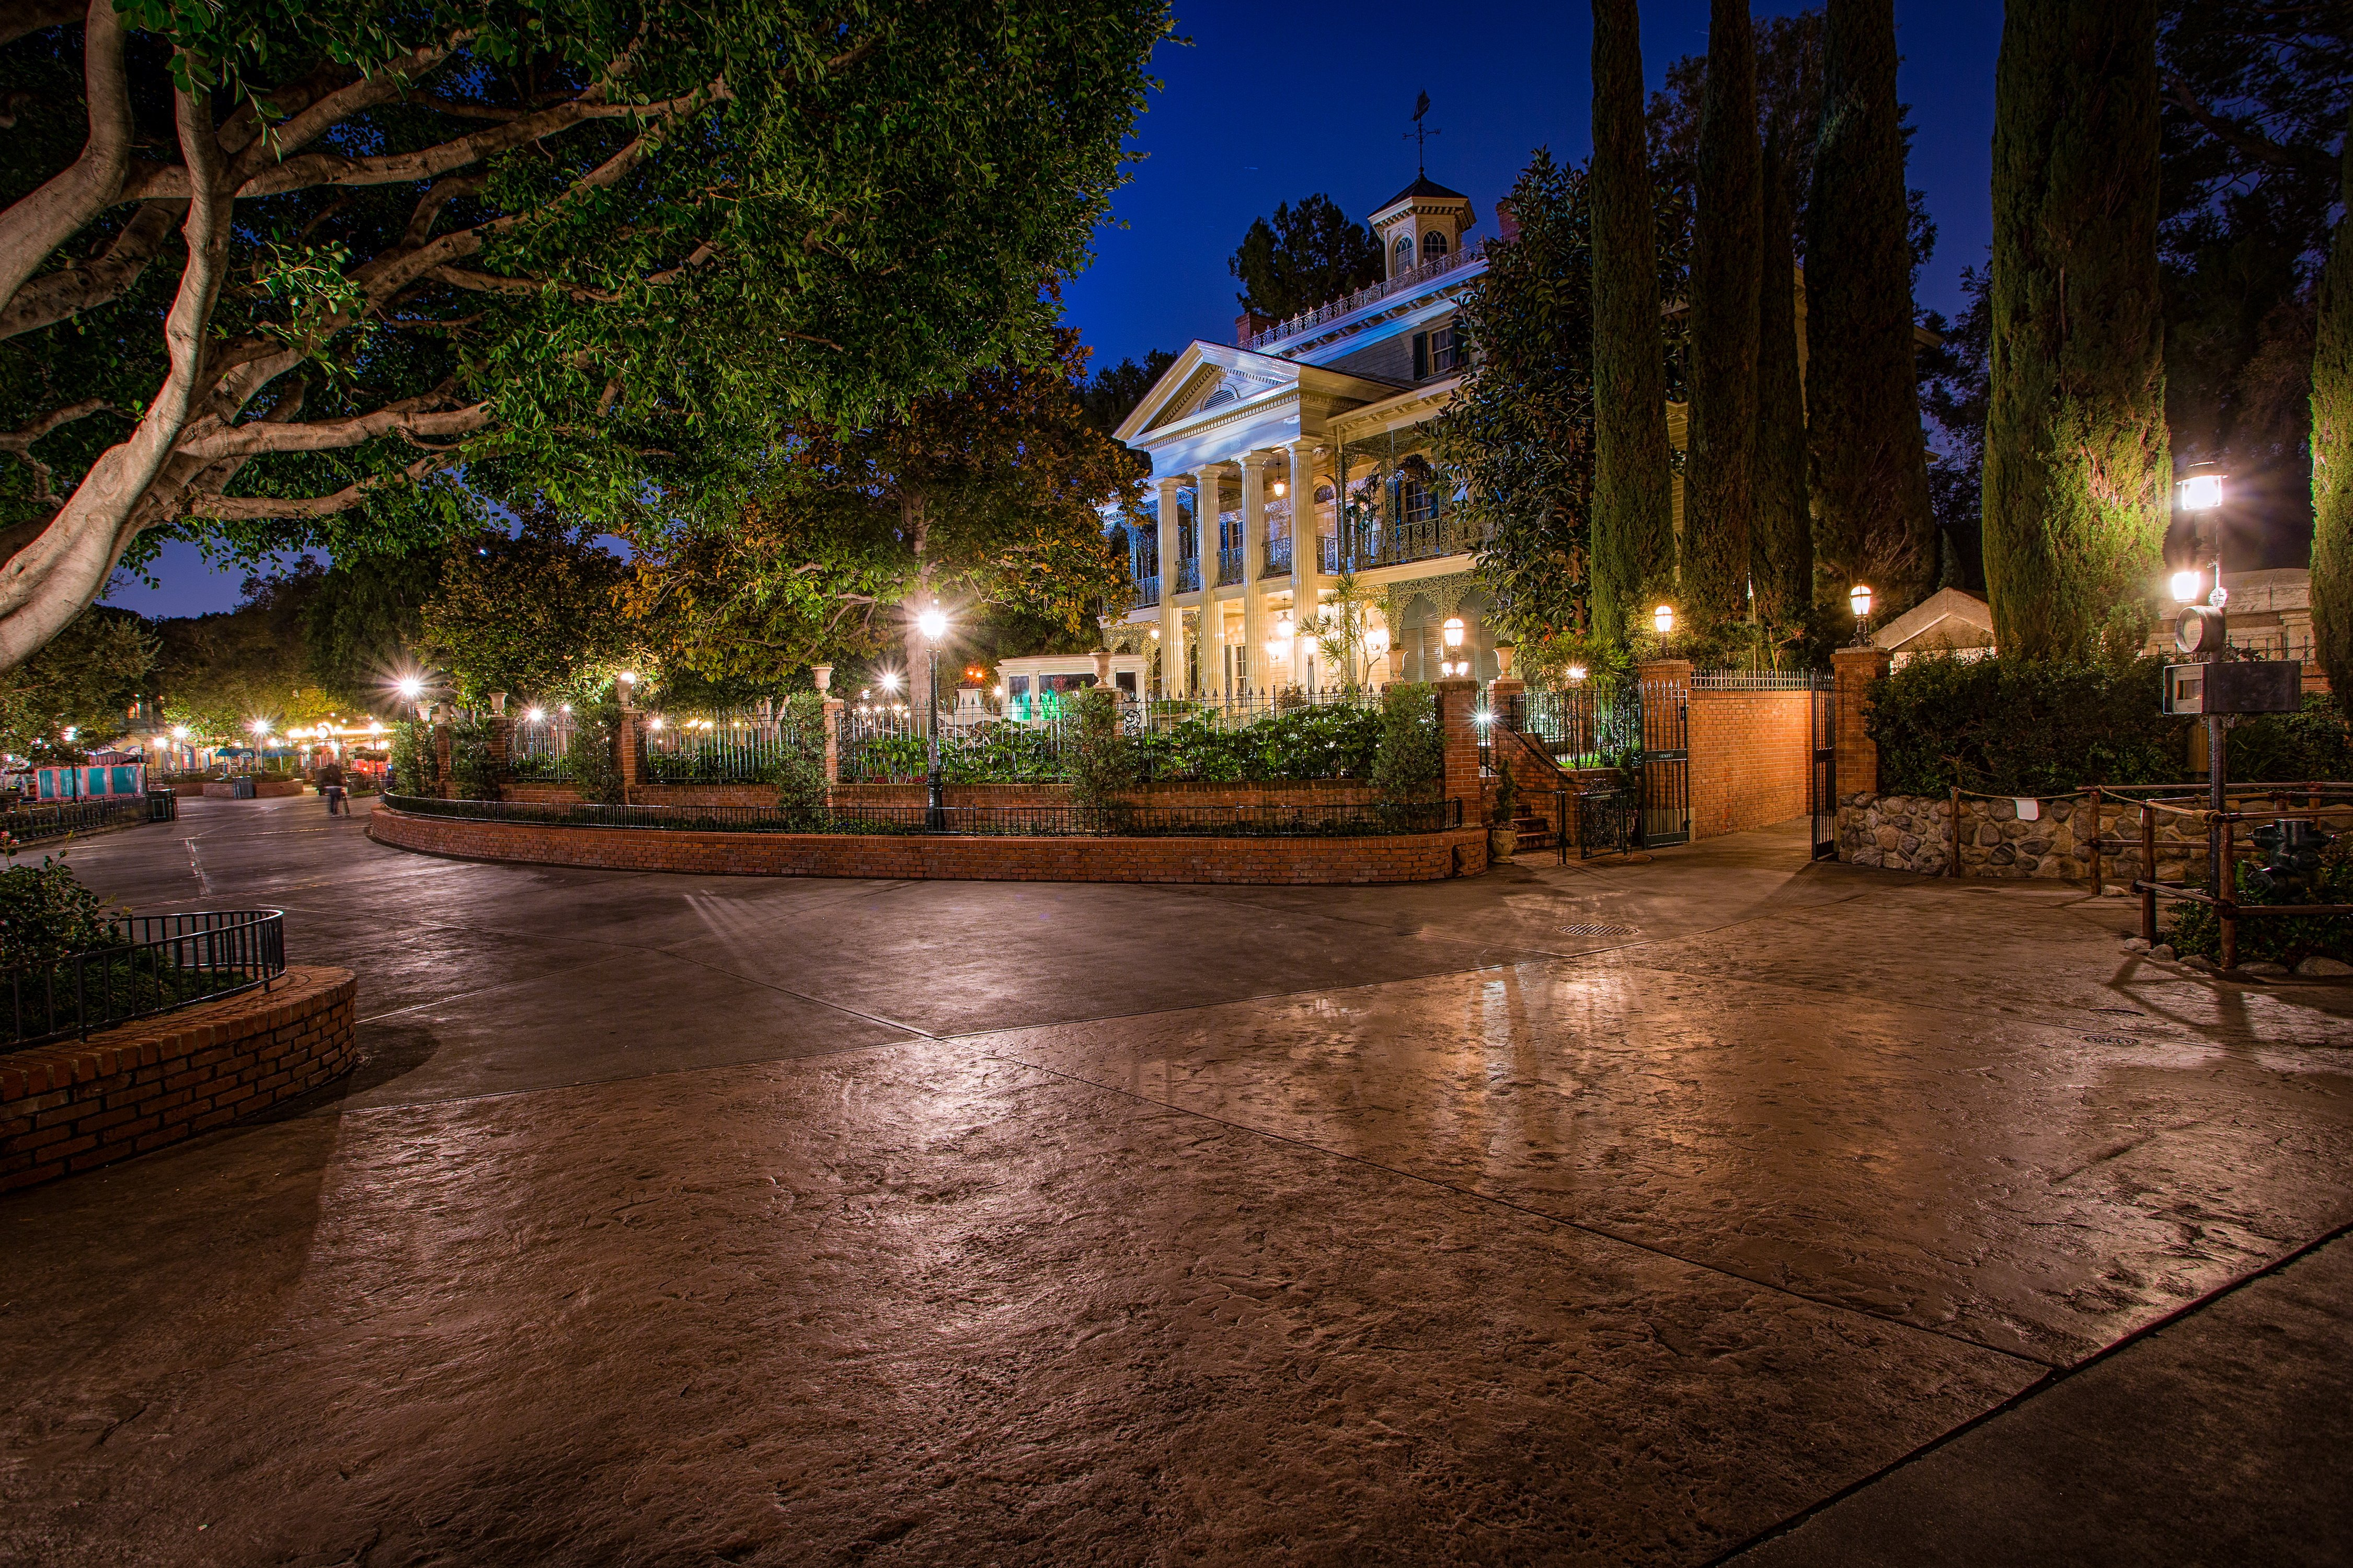 USA Disneyland Parks Houses California Anaheim Design HDR Night Street Lights Trees Cities Wallpaper